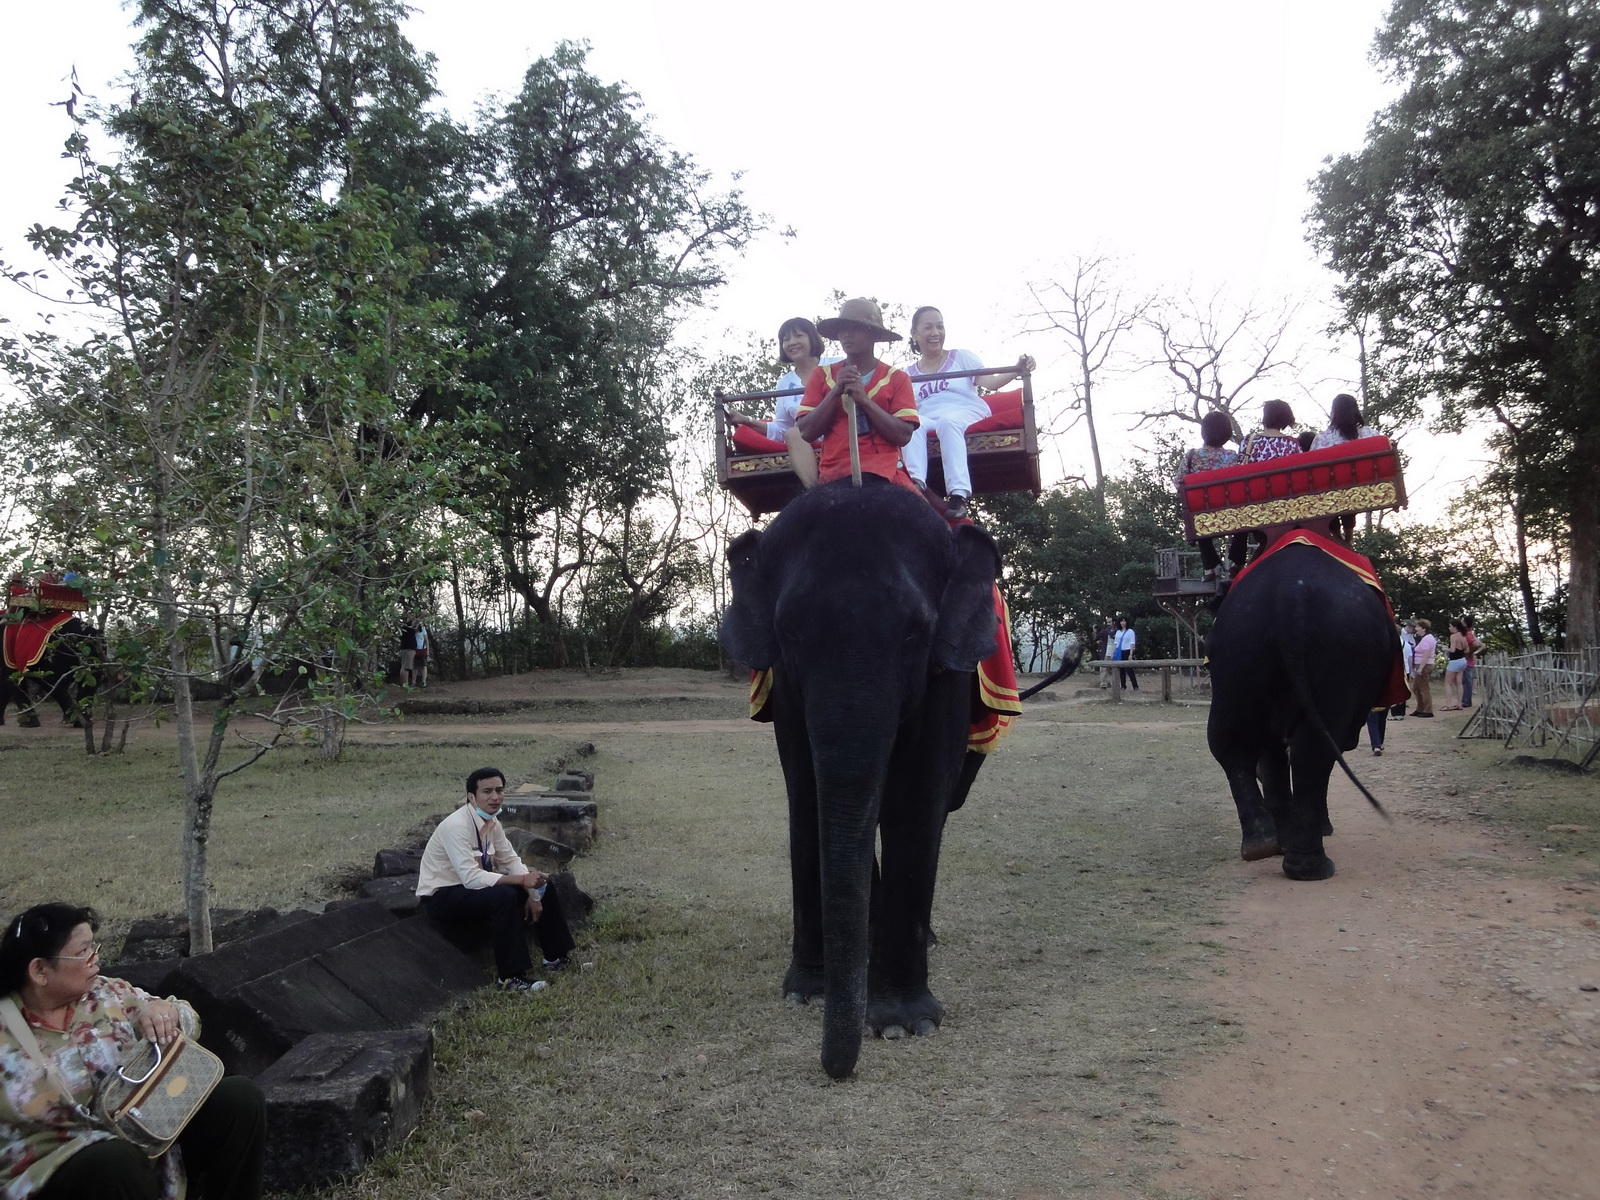 Phnom Bakheng Temple Camdodian elephant ride Angkor 04